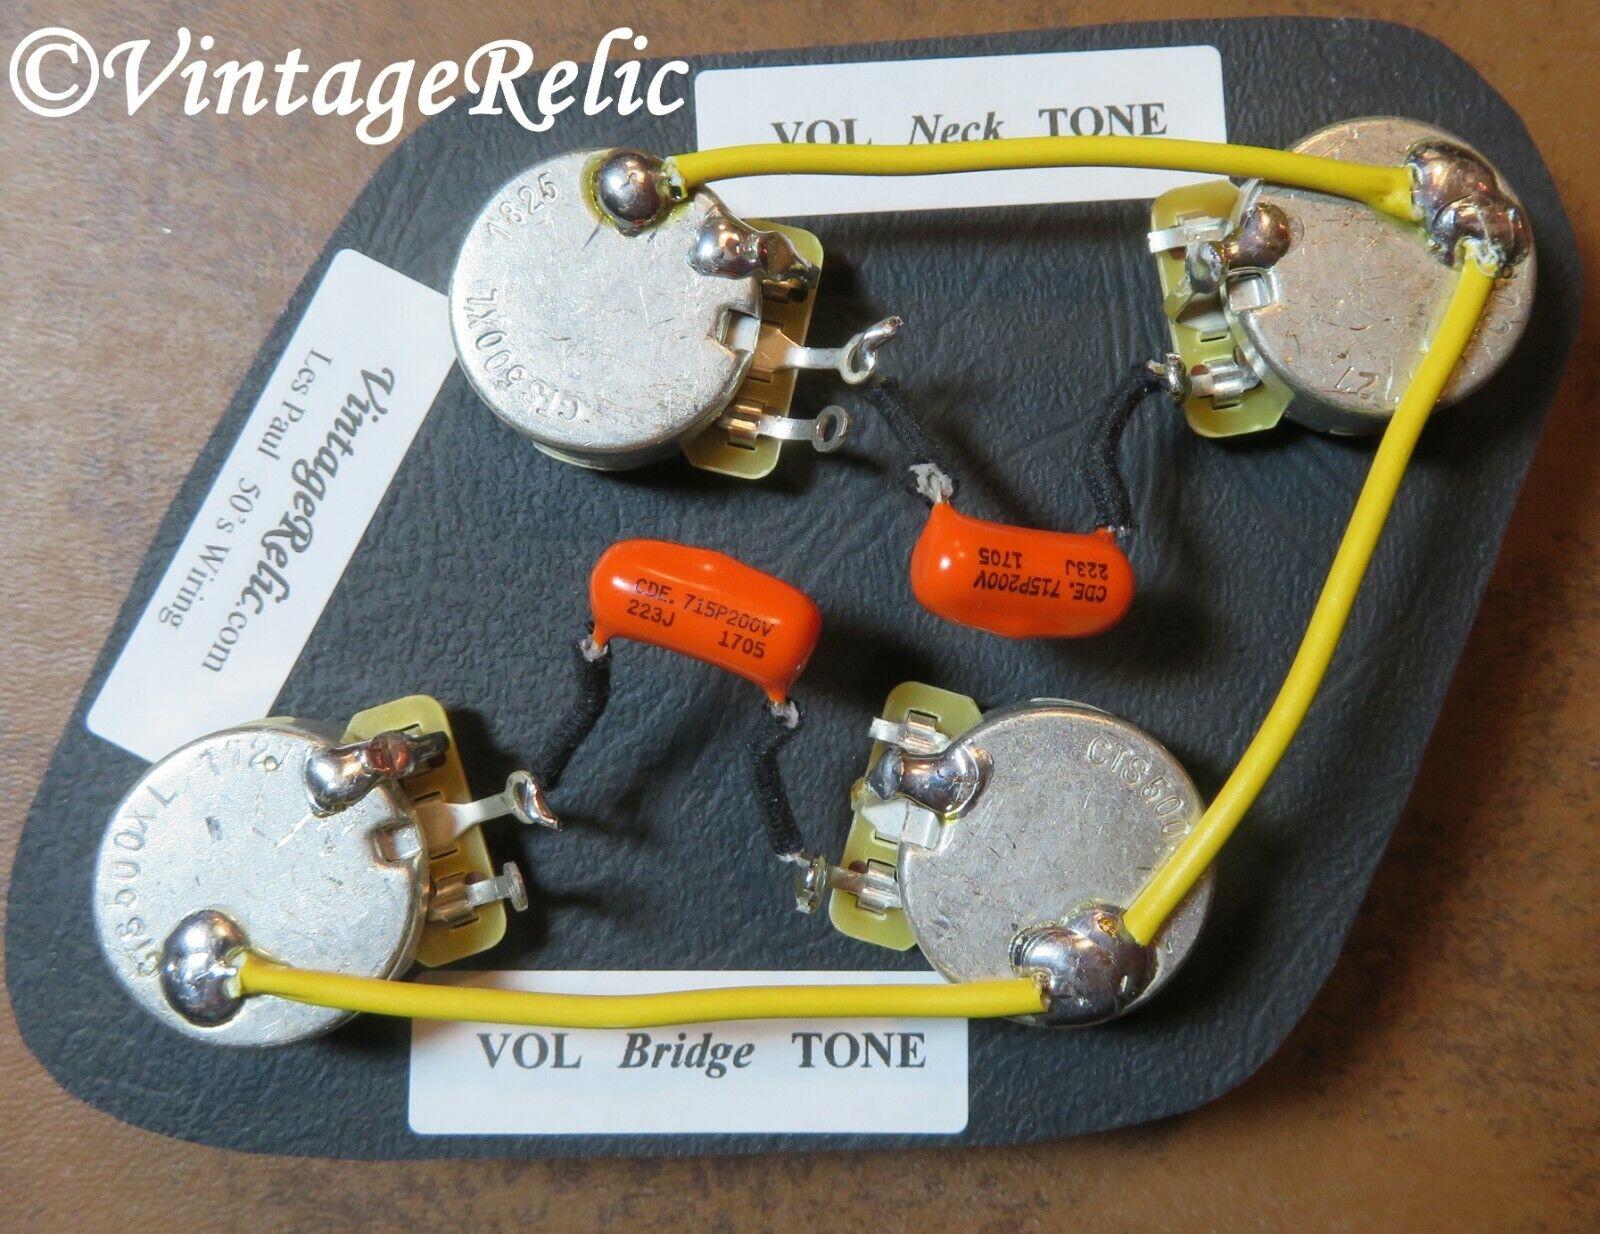 Les Paul Wiring Harness Vintage Orange Drop .022uF Caps CTS 525k Pro Long Shaft